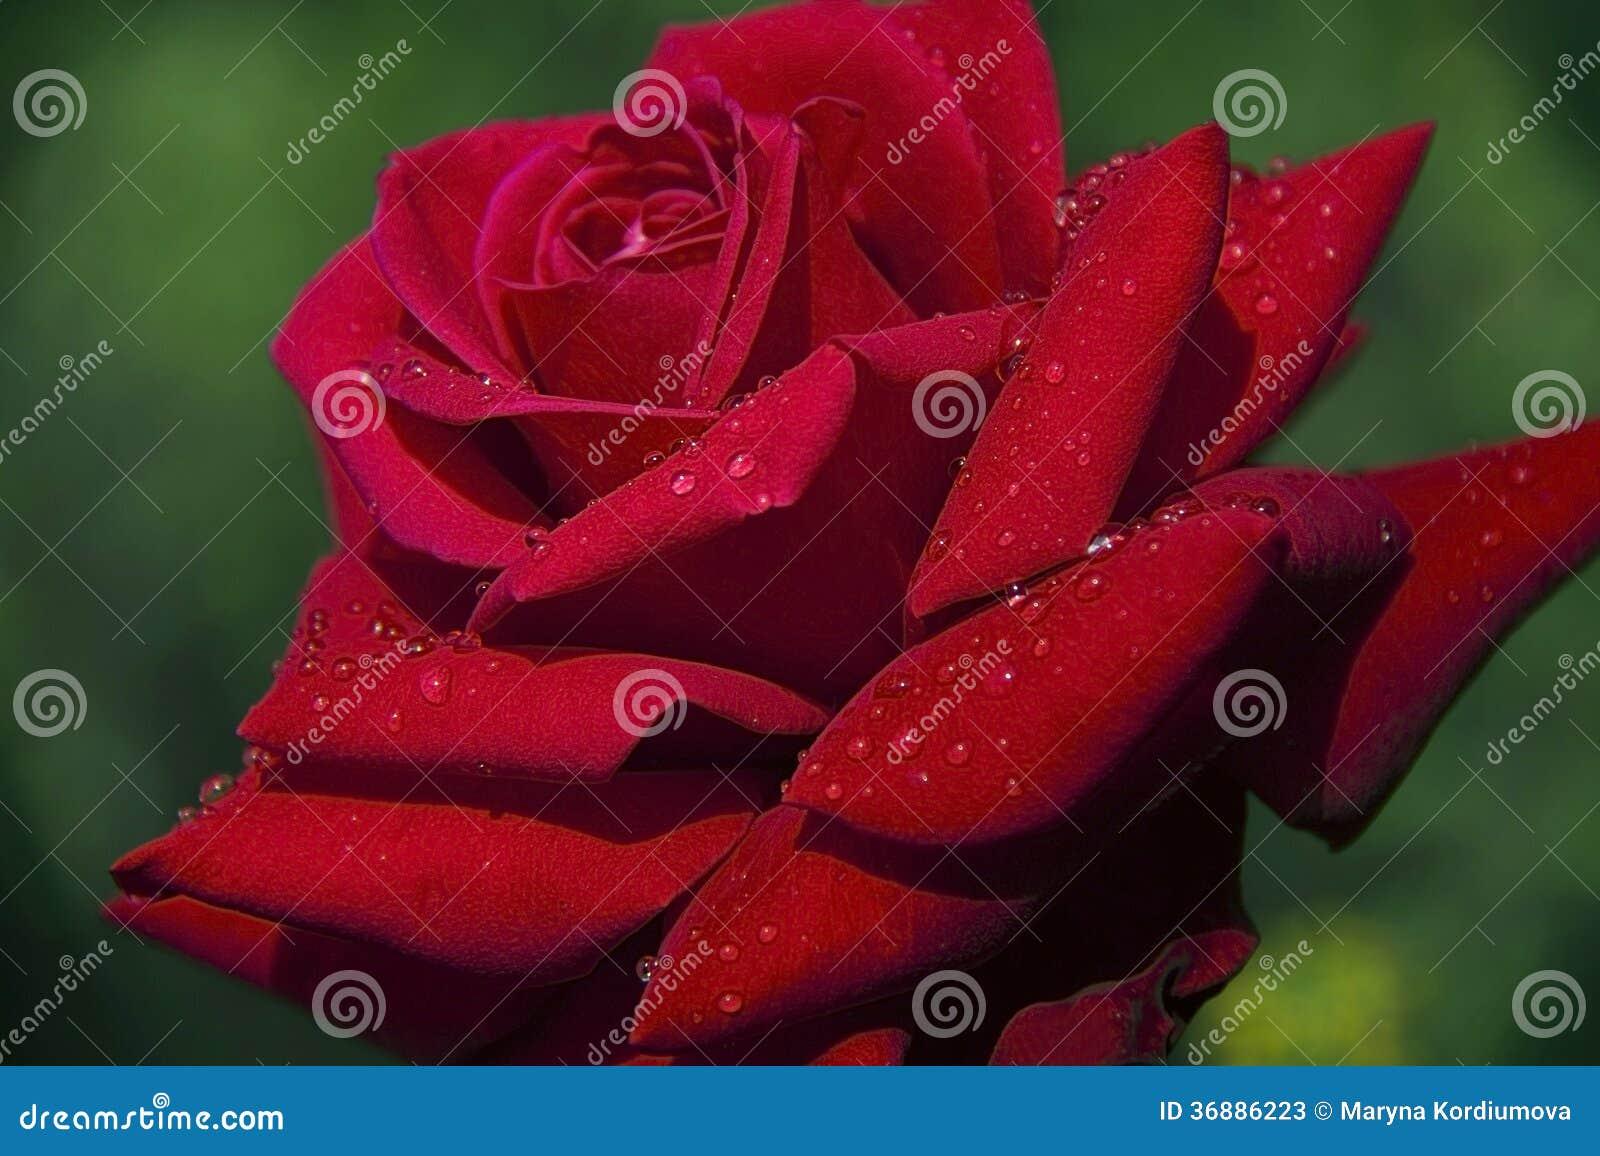 Download Rosa rossa immagine stock. Immagine di fioritura, flora - 36886223